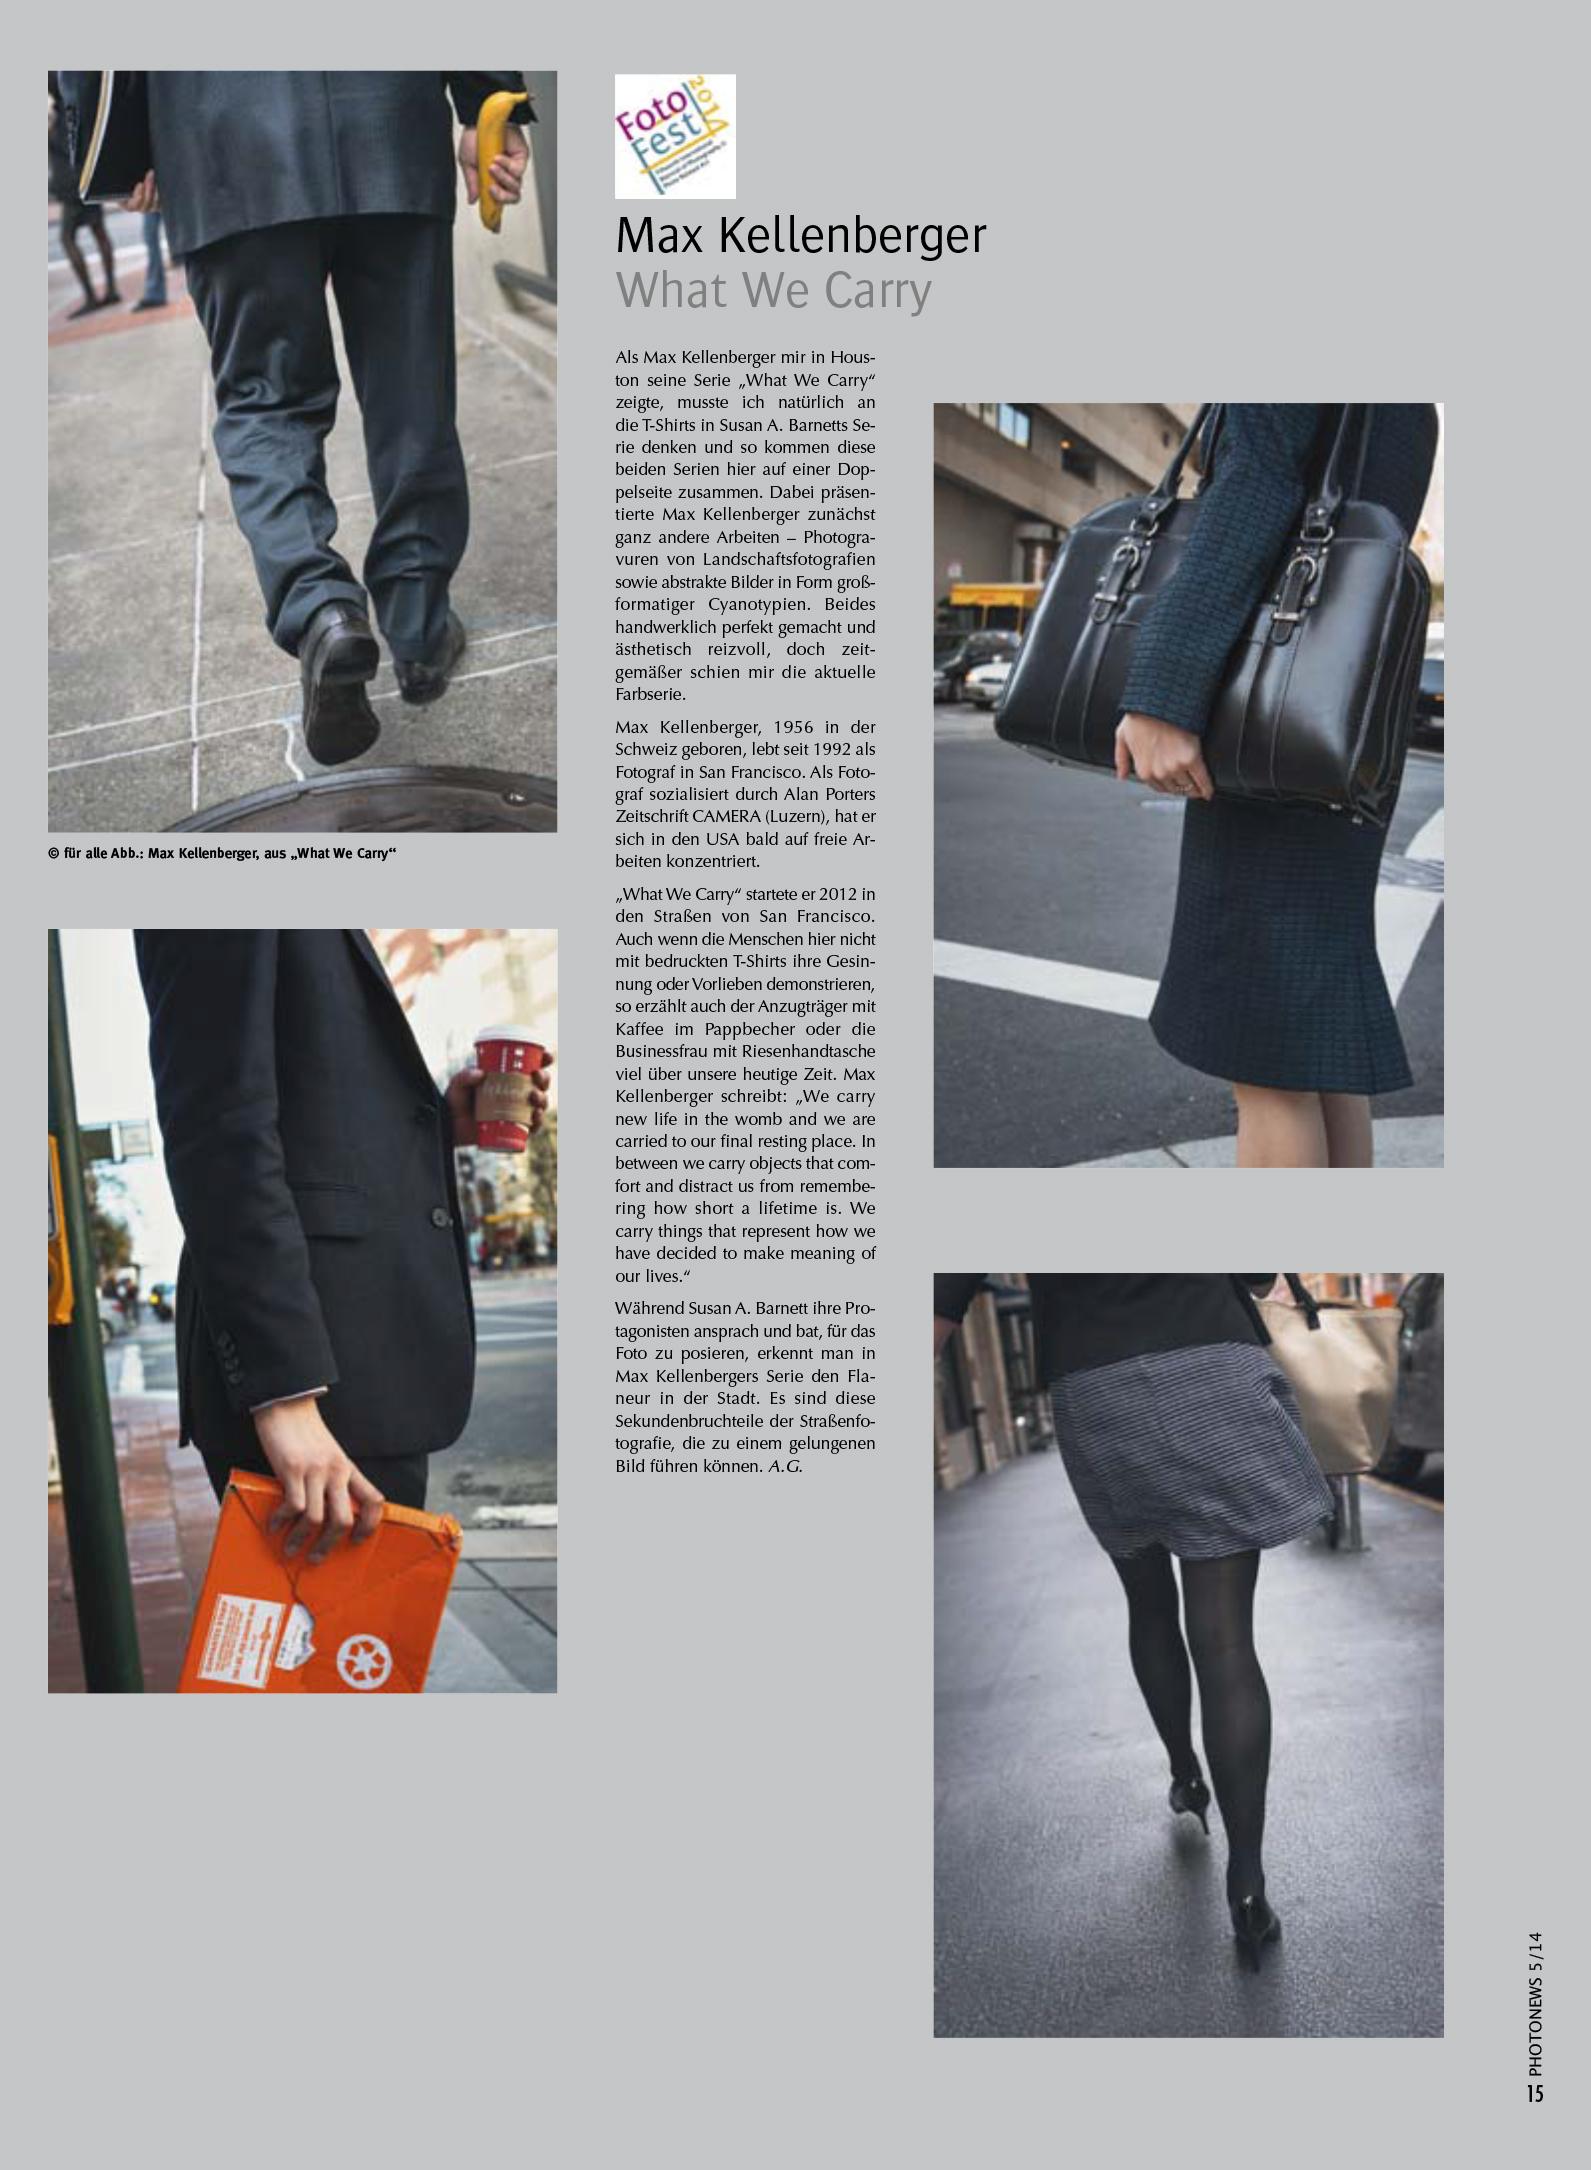 photonews 5/14, p.15